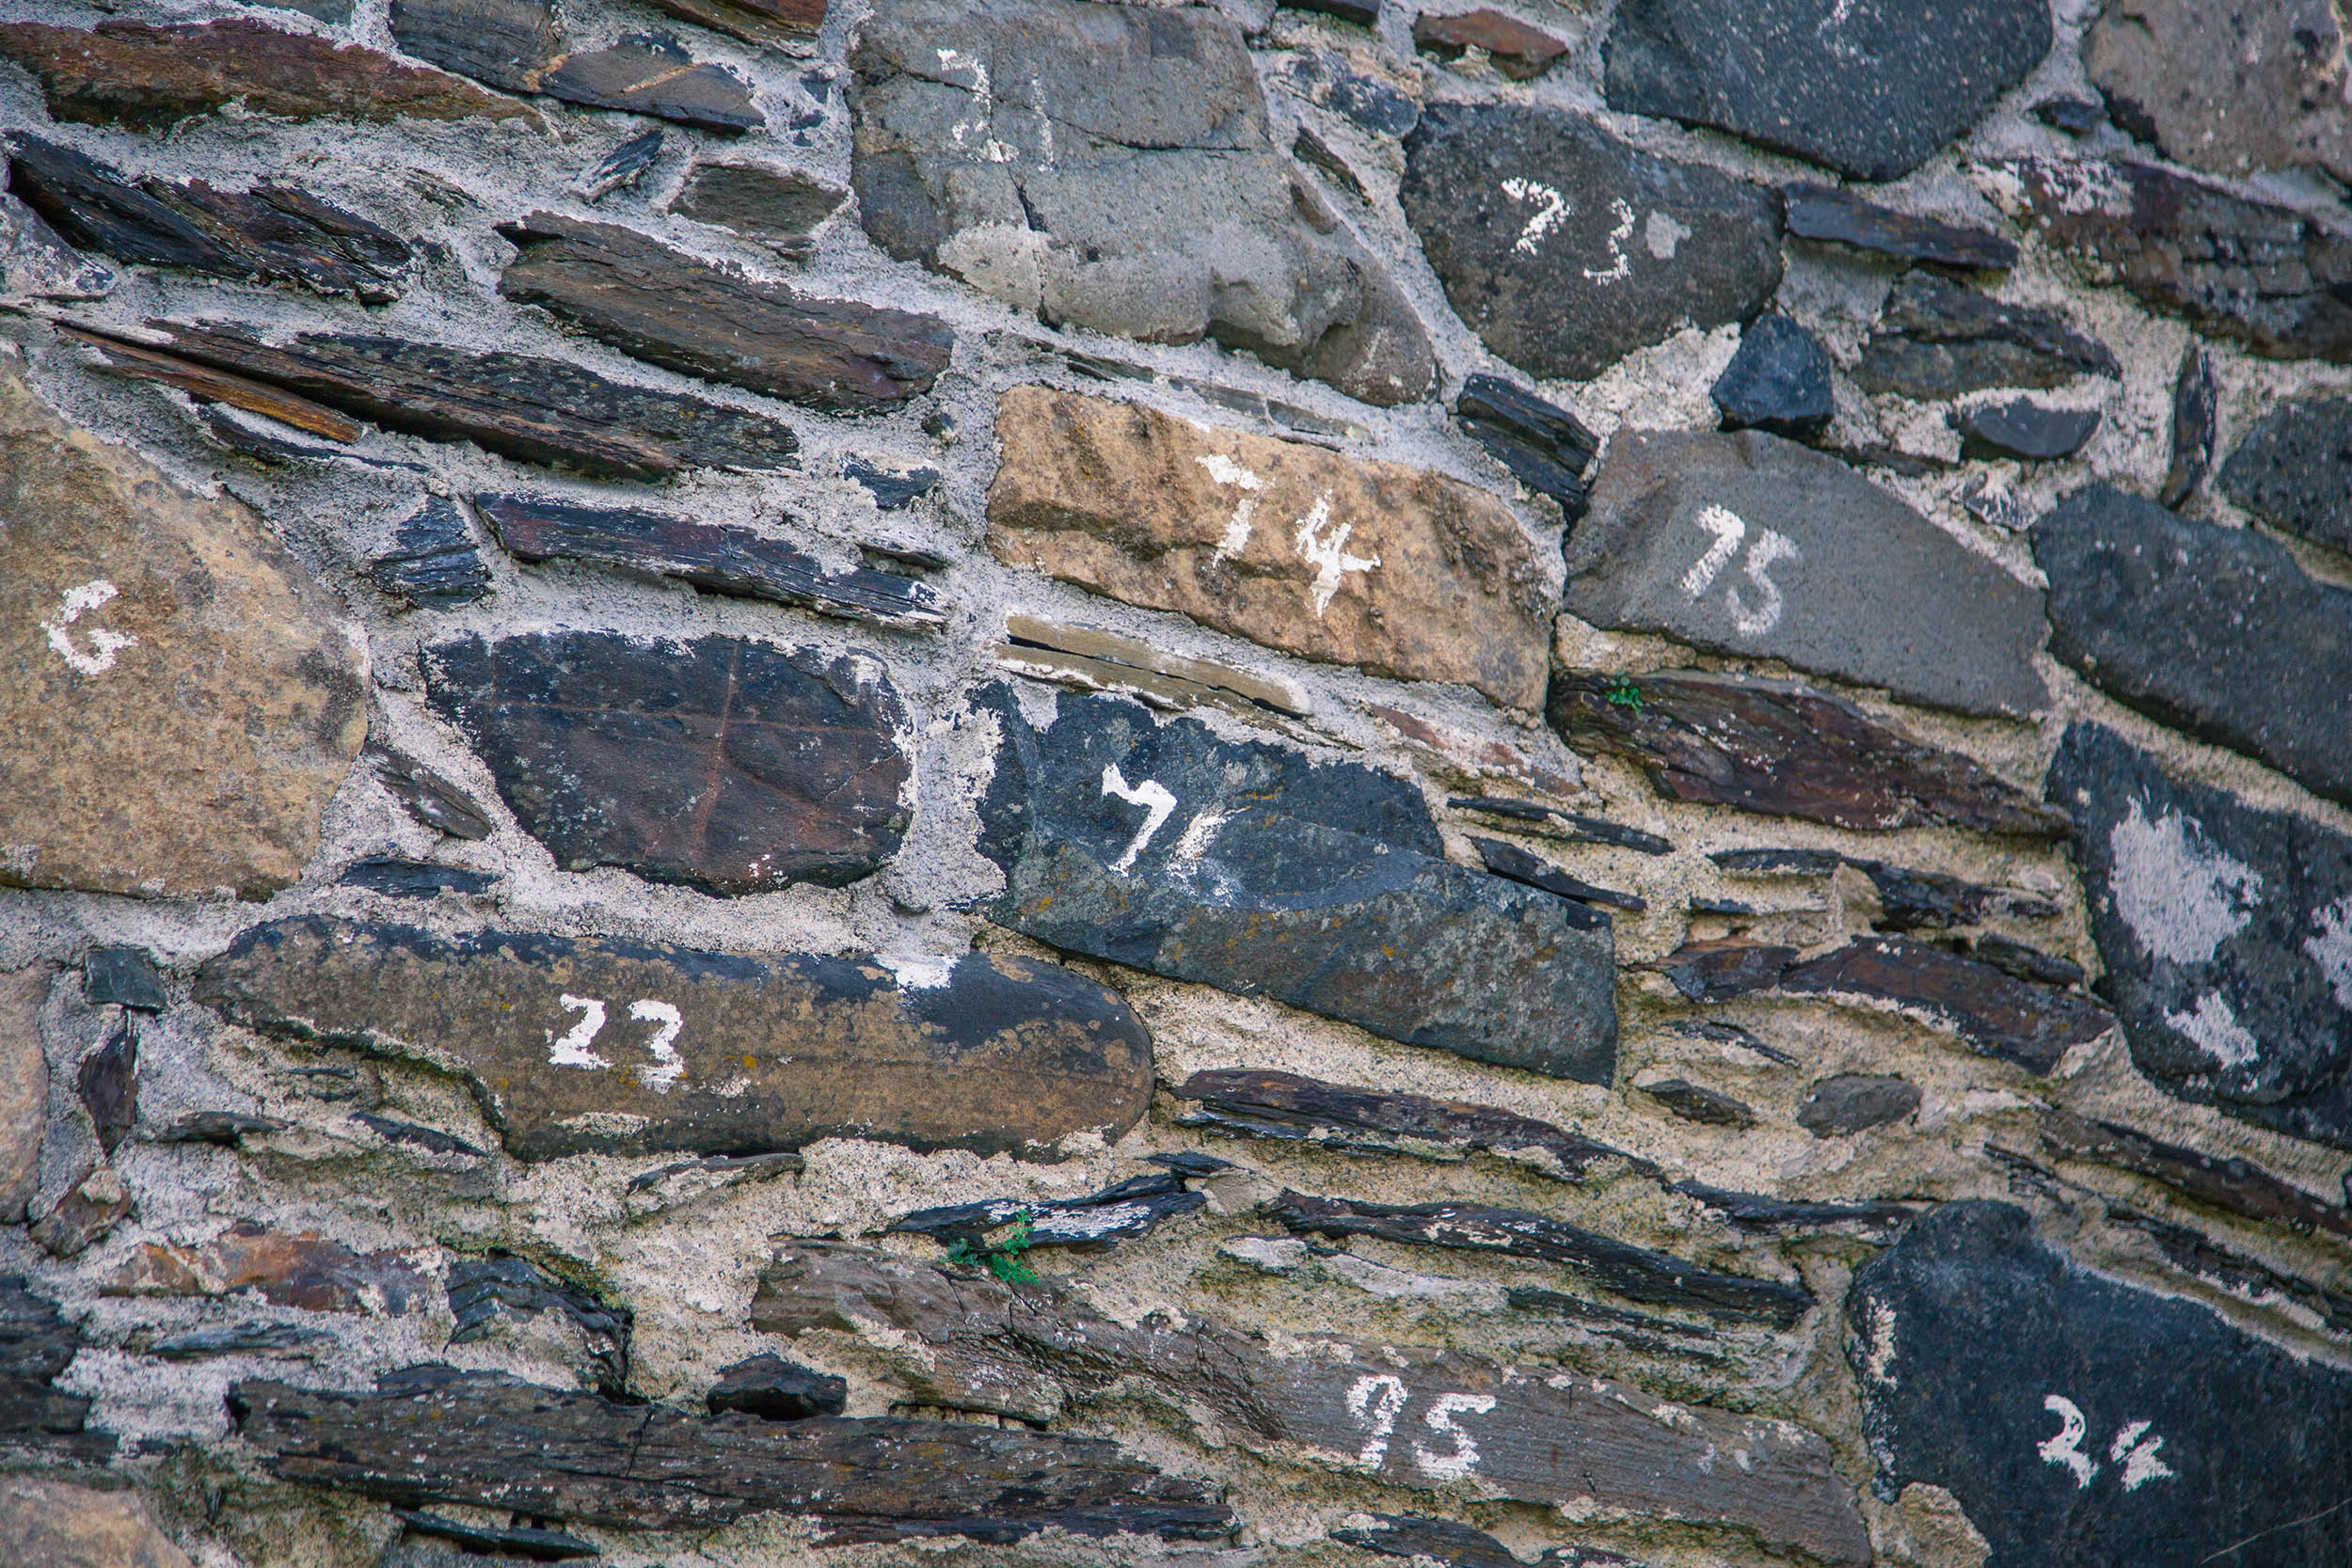 IRELAND_DONEGAL_PORTNOO_0011